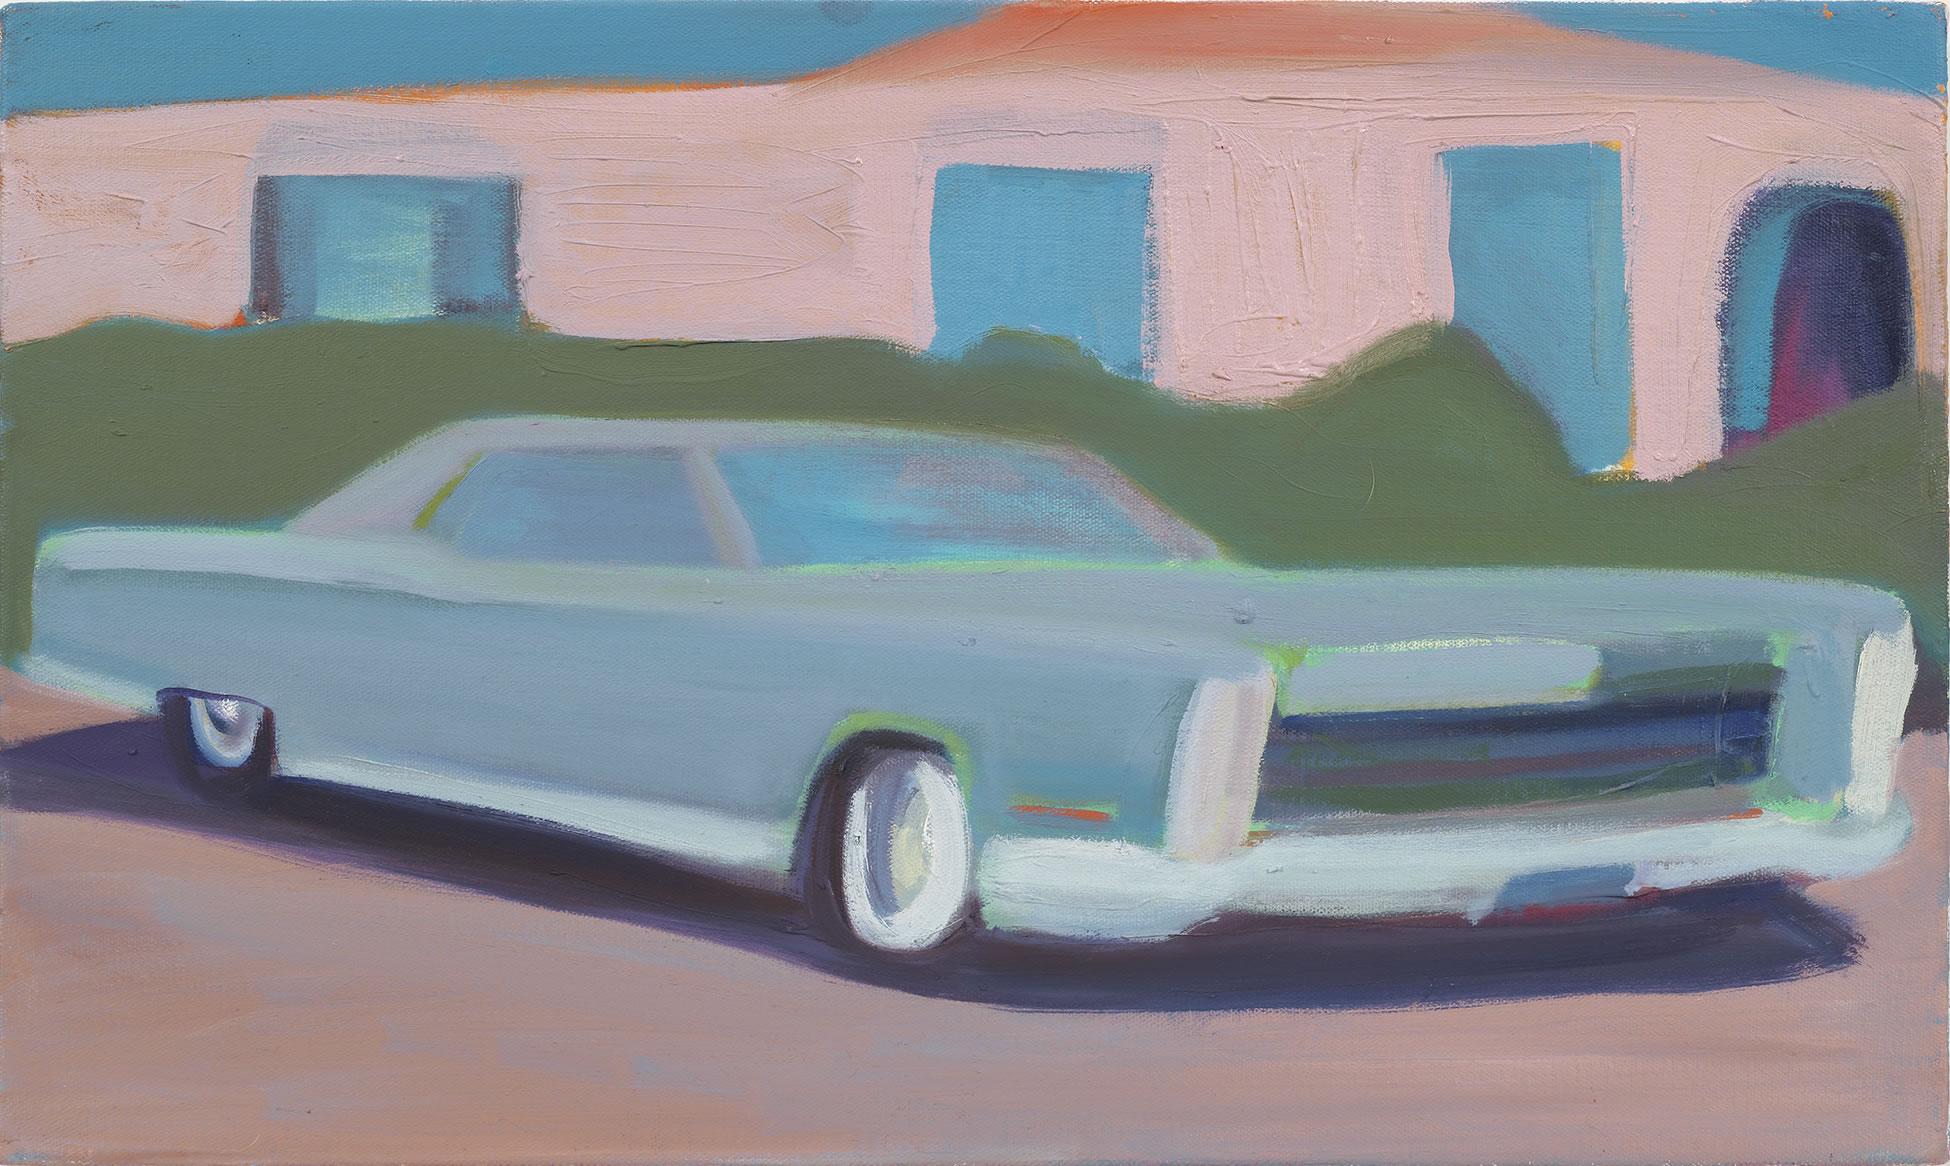 Cadillac_00025